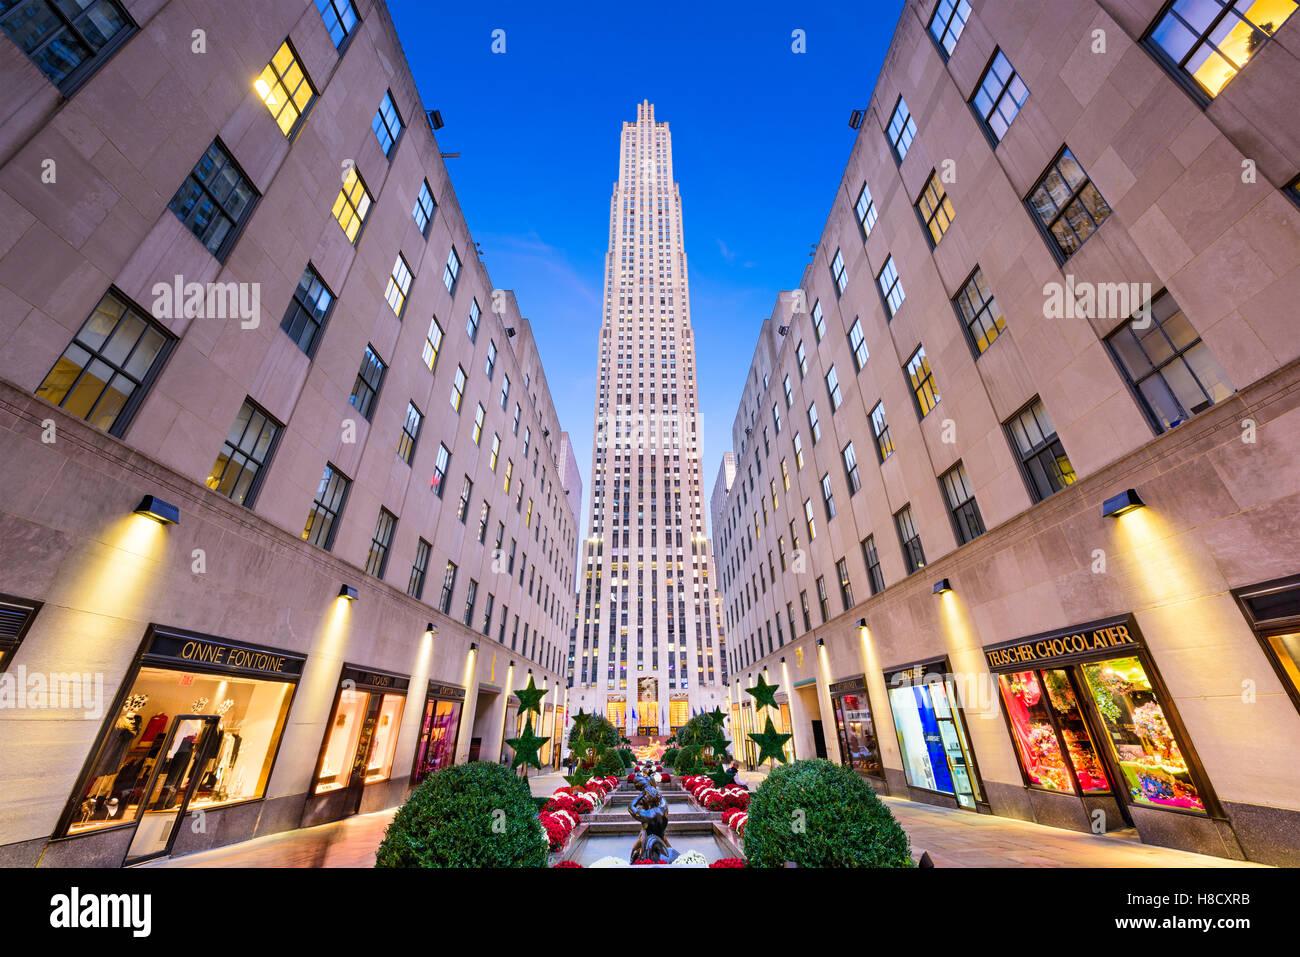 NEW YORK CITY - NOVEMBER 2, 2016: Rockefeller Center in New York. The historic landmark was completed in 1939. - Stock Image